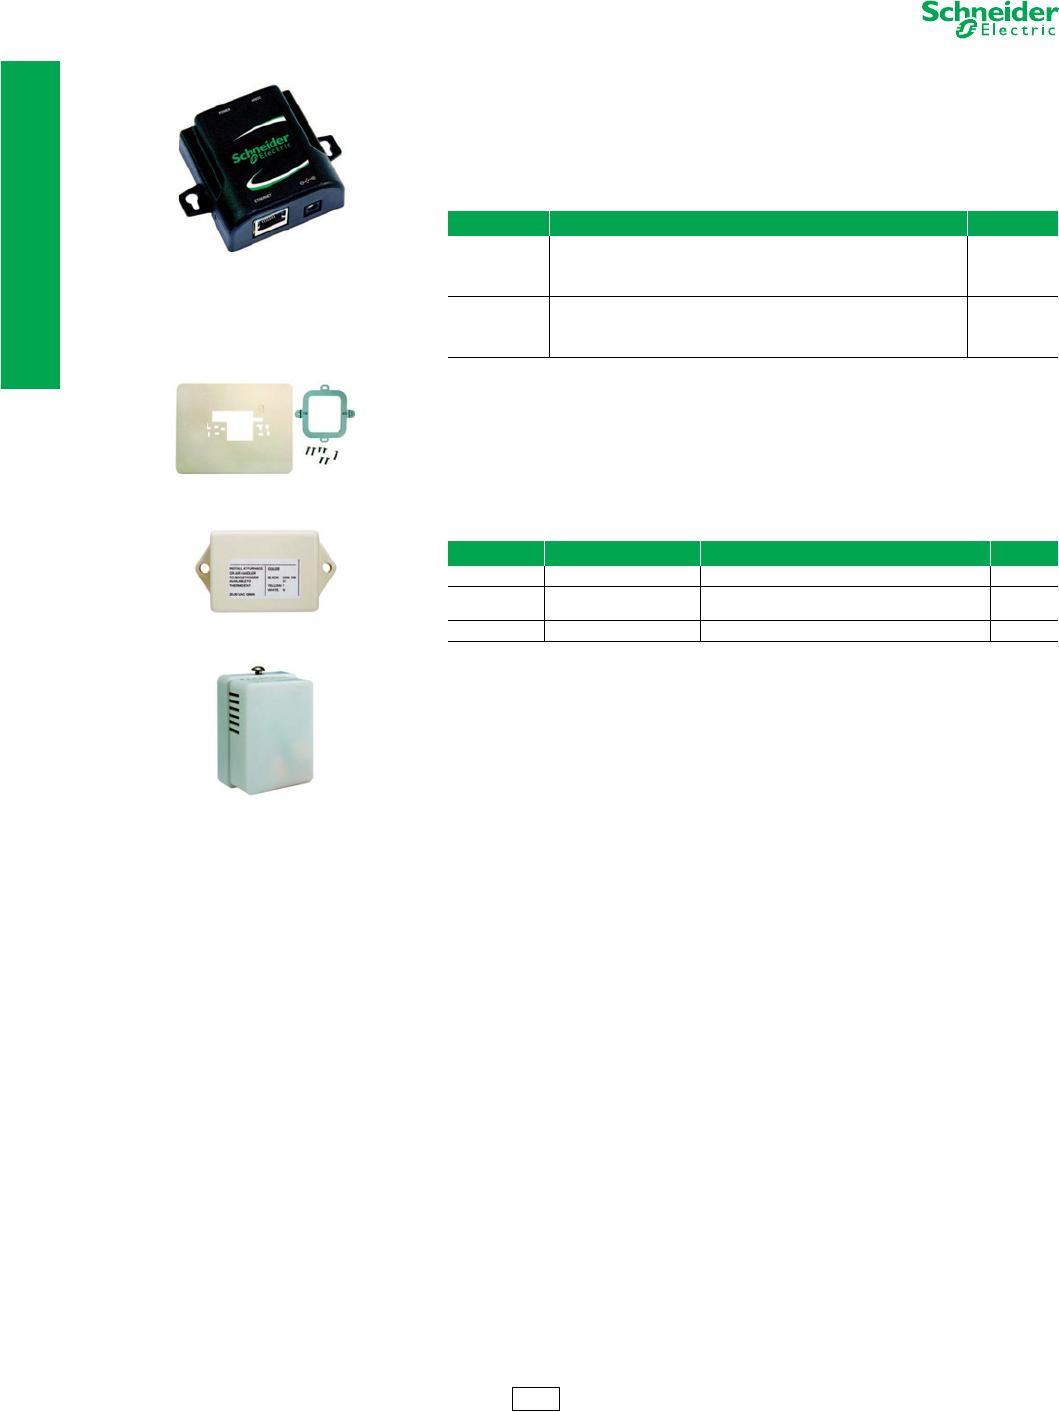 632600 Catalog Gt Circuit Breakers Square D Hom115cafic Homeline Single Pole Arc Schneider Electricus